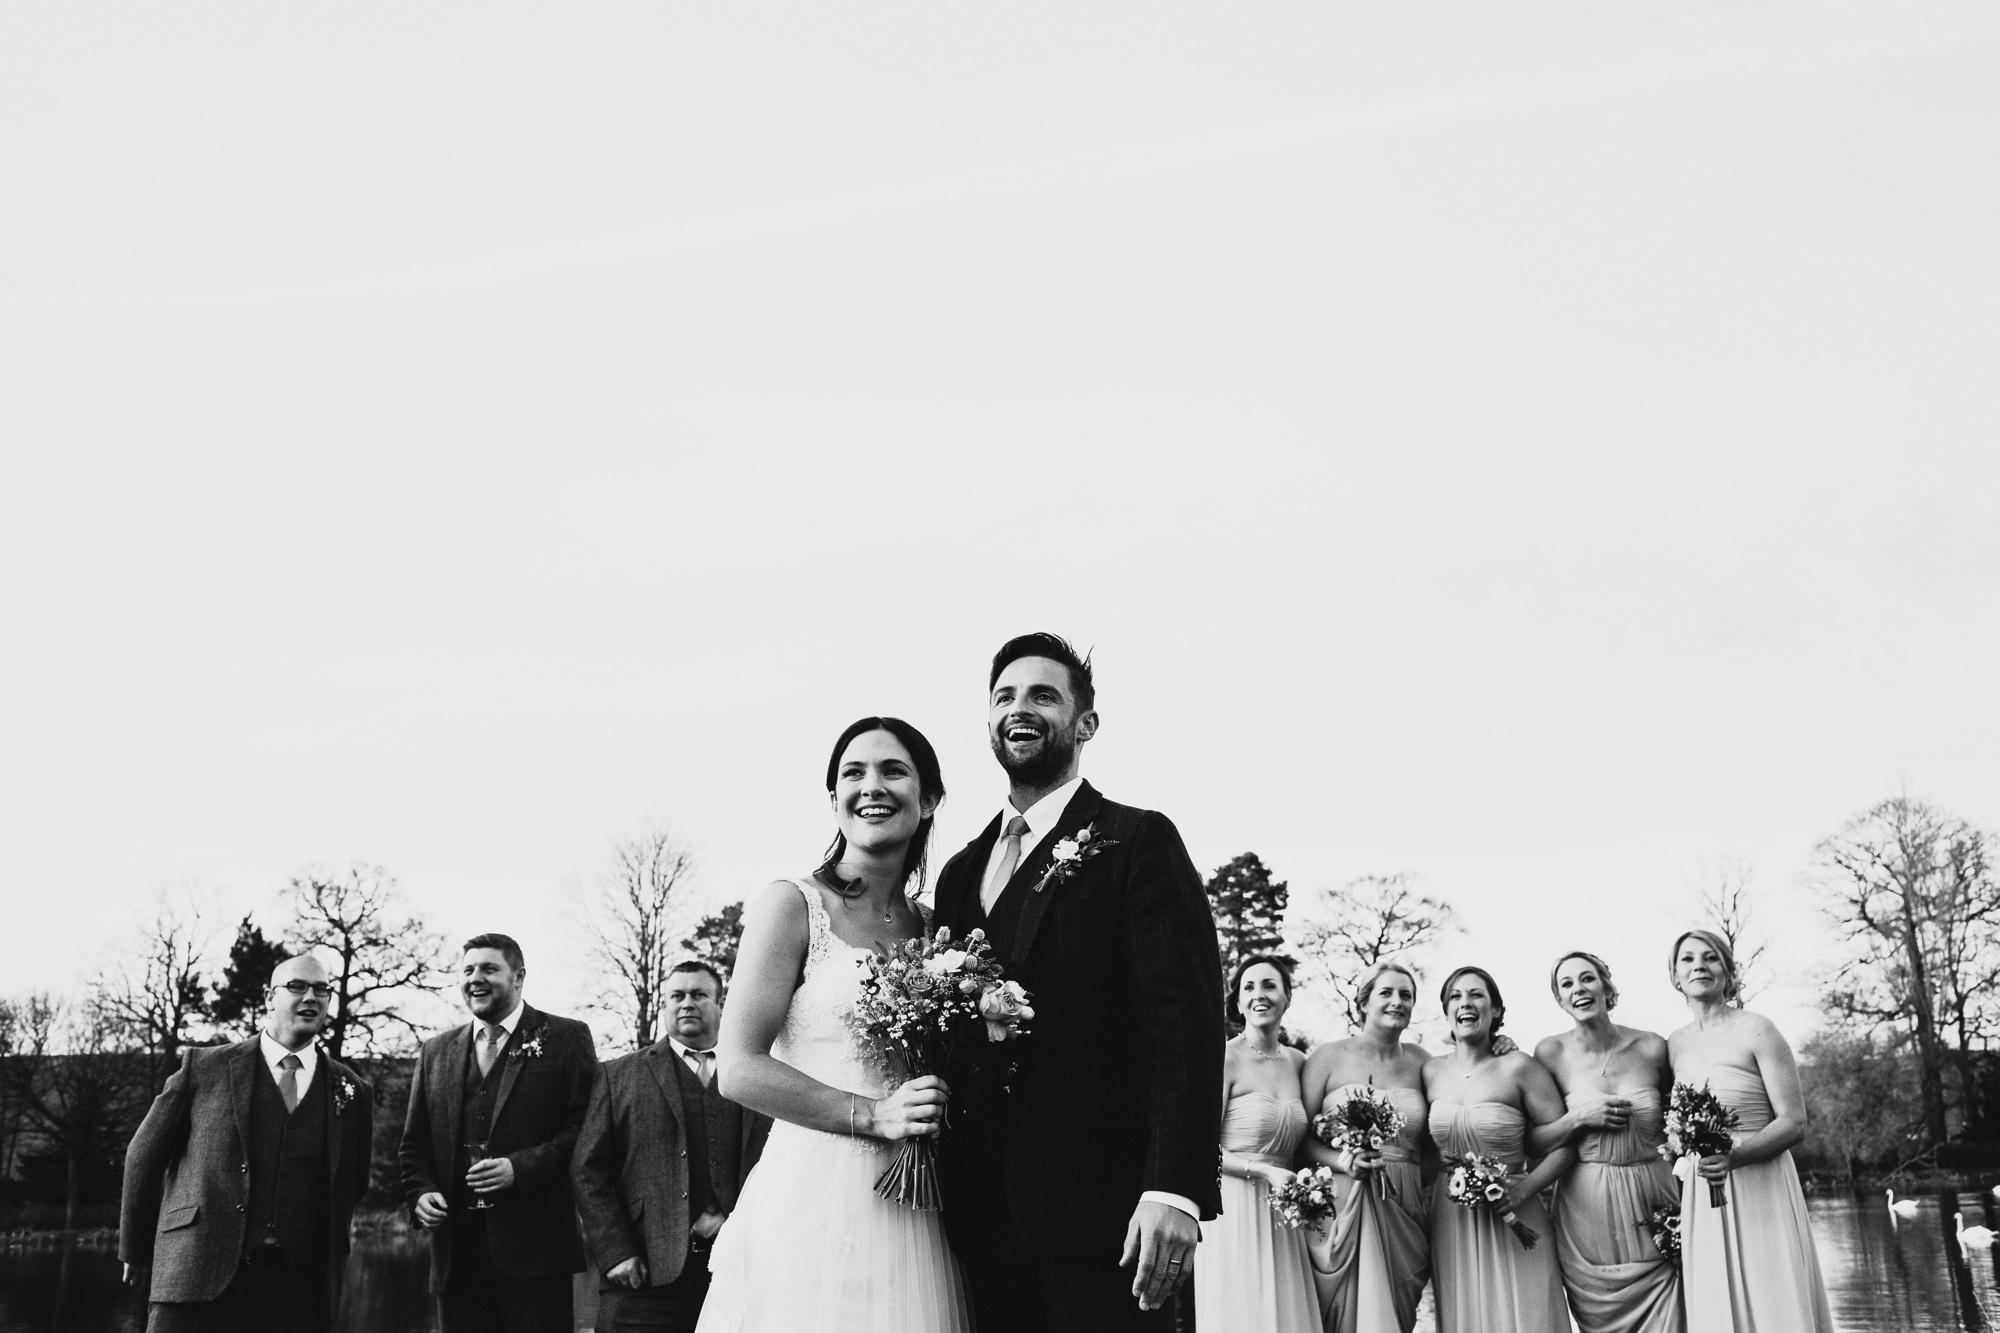 Walcot hall wedding photography shropshire 38